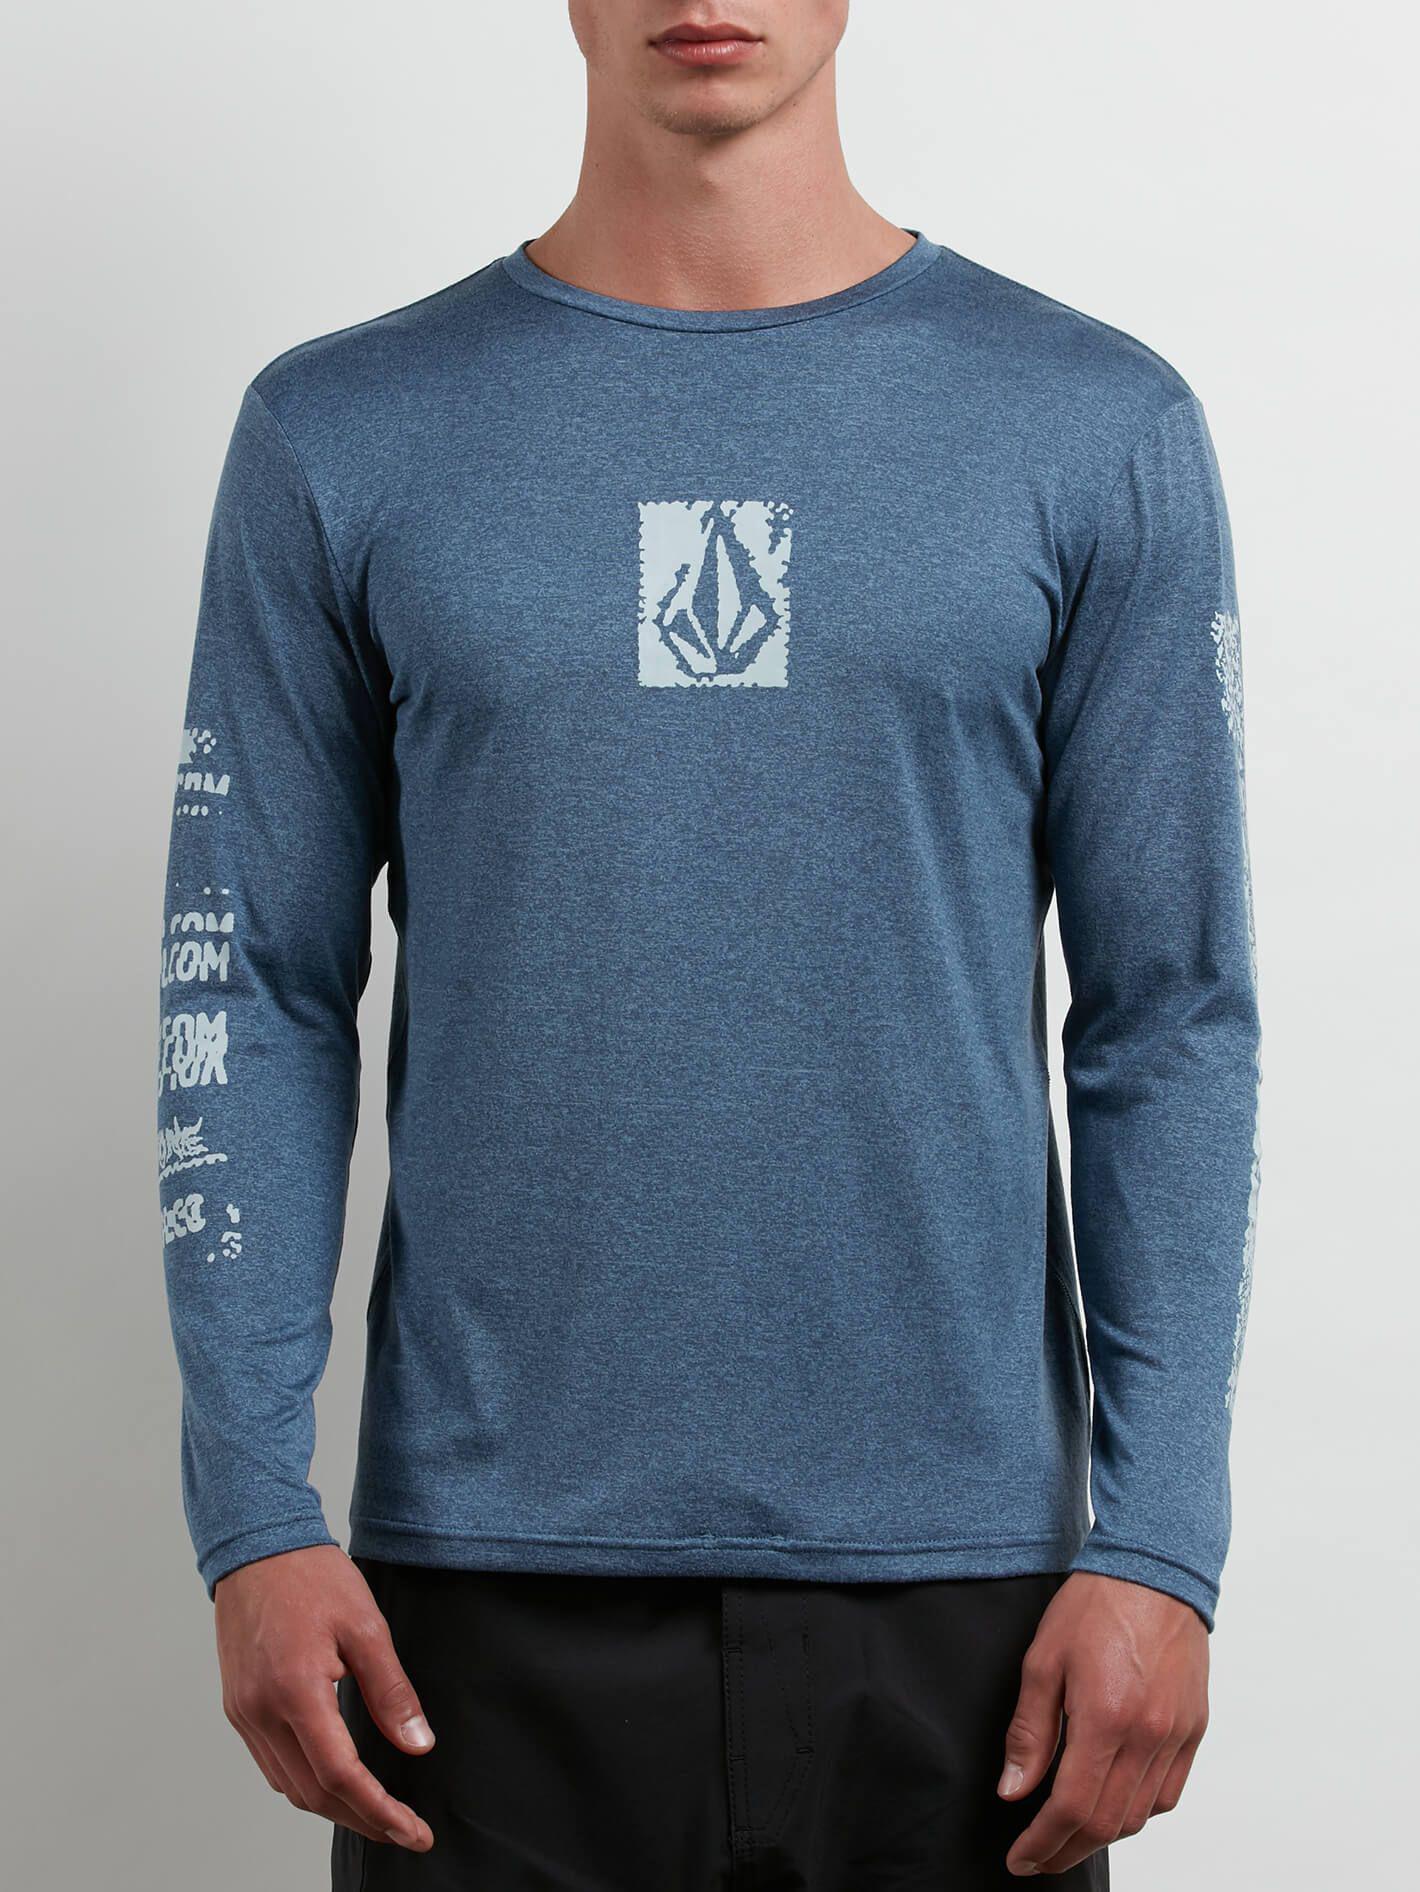 Volcom. Men's Blue Lido Pixel Heather Long Sleeve Rashguard